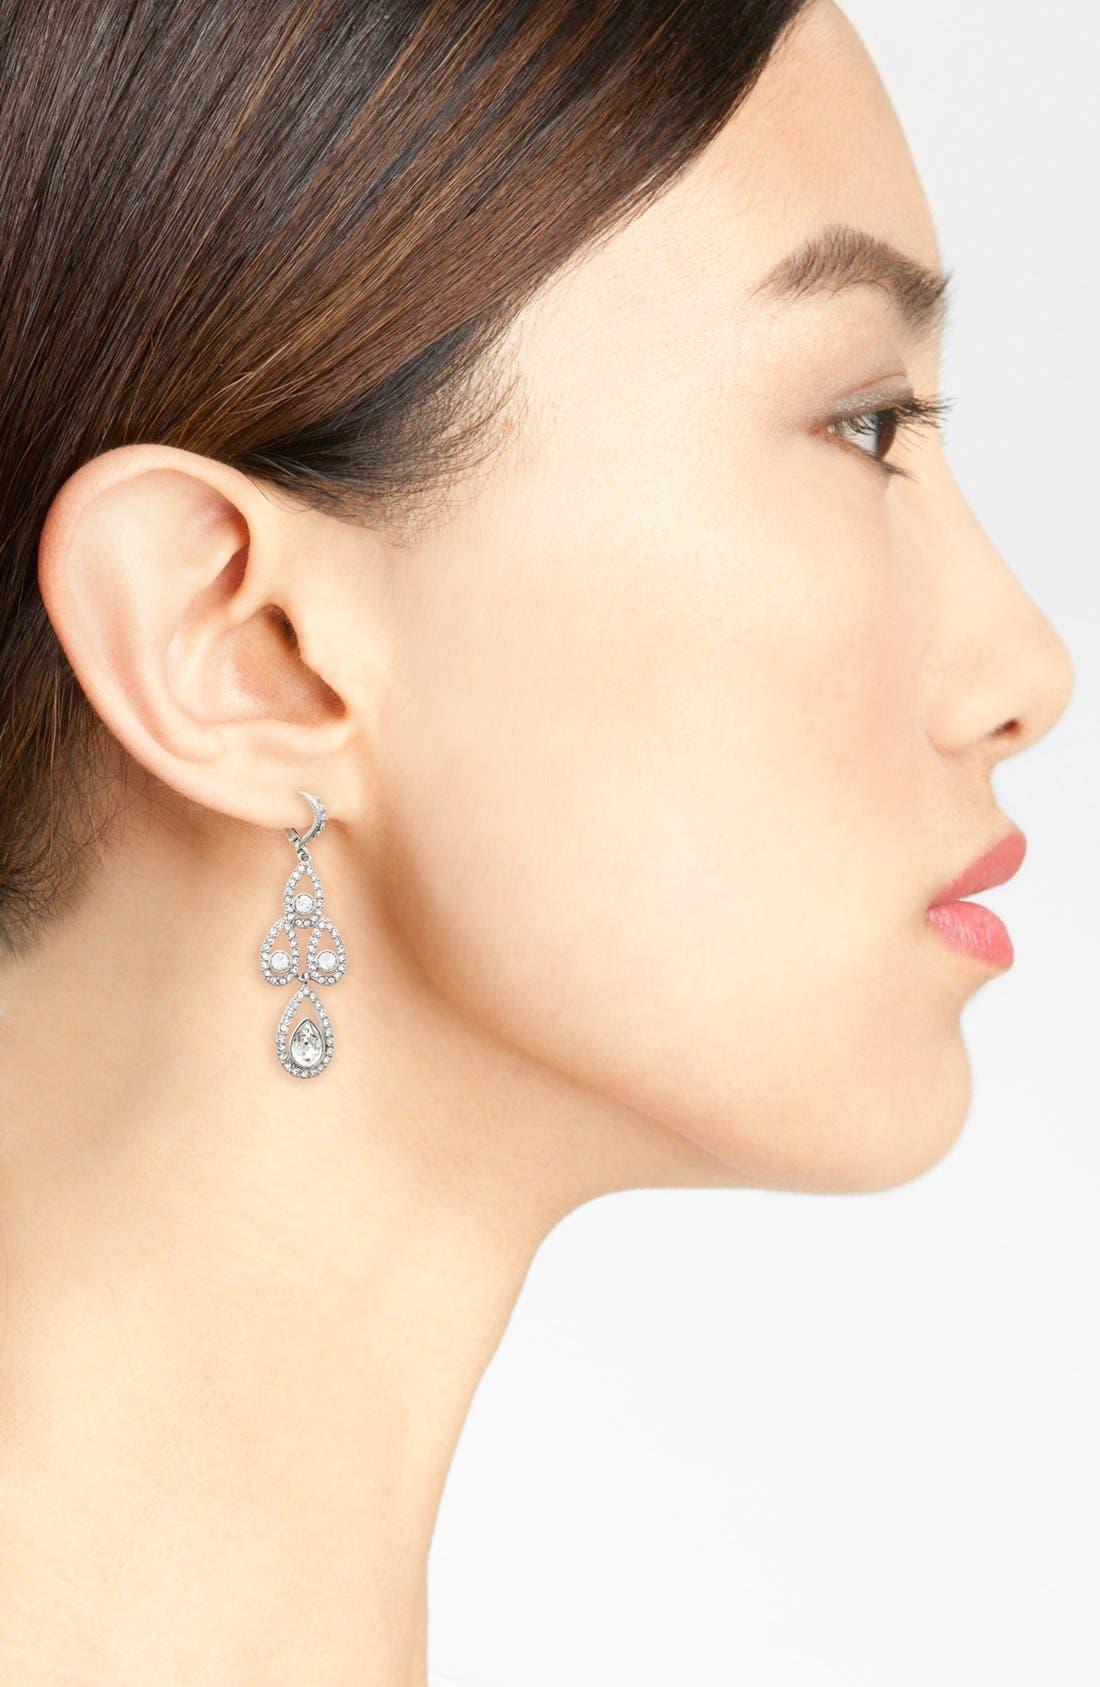 Crystal Chandelier Drop Earrings,                             Alternate thumbnail 2, color,                             040